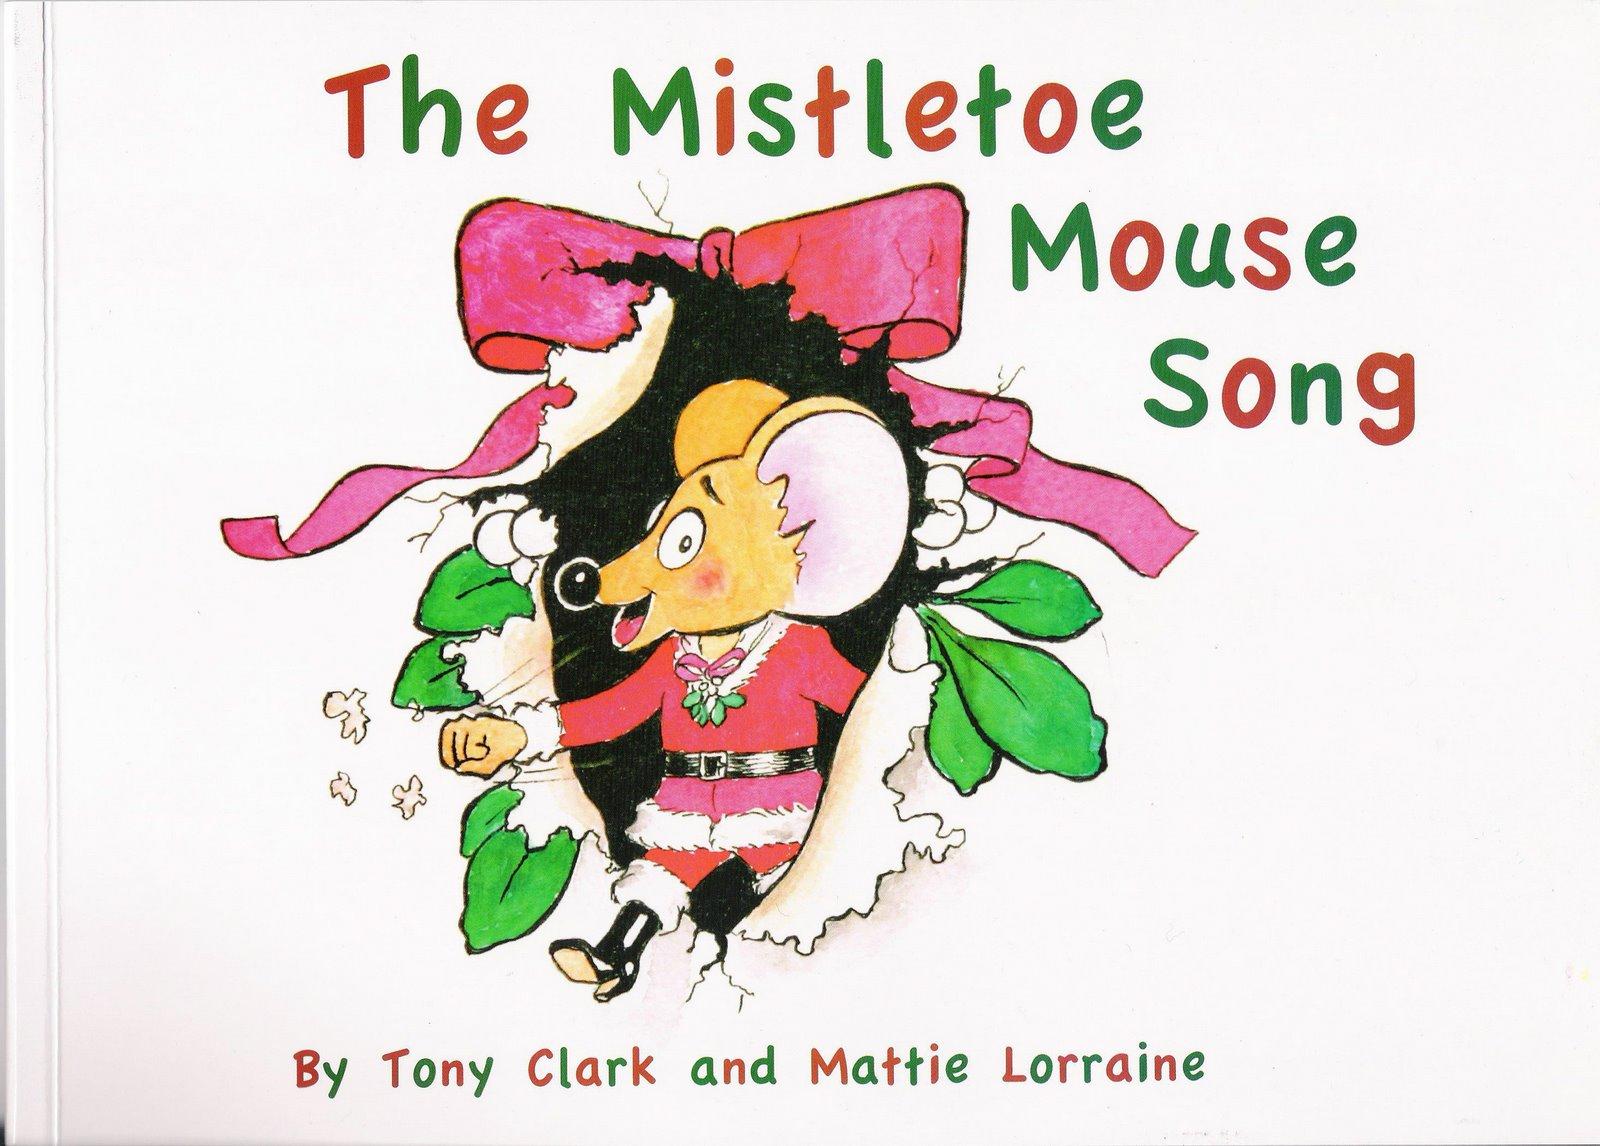 [Mistletoe+Mouse]